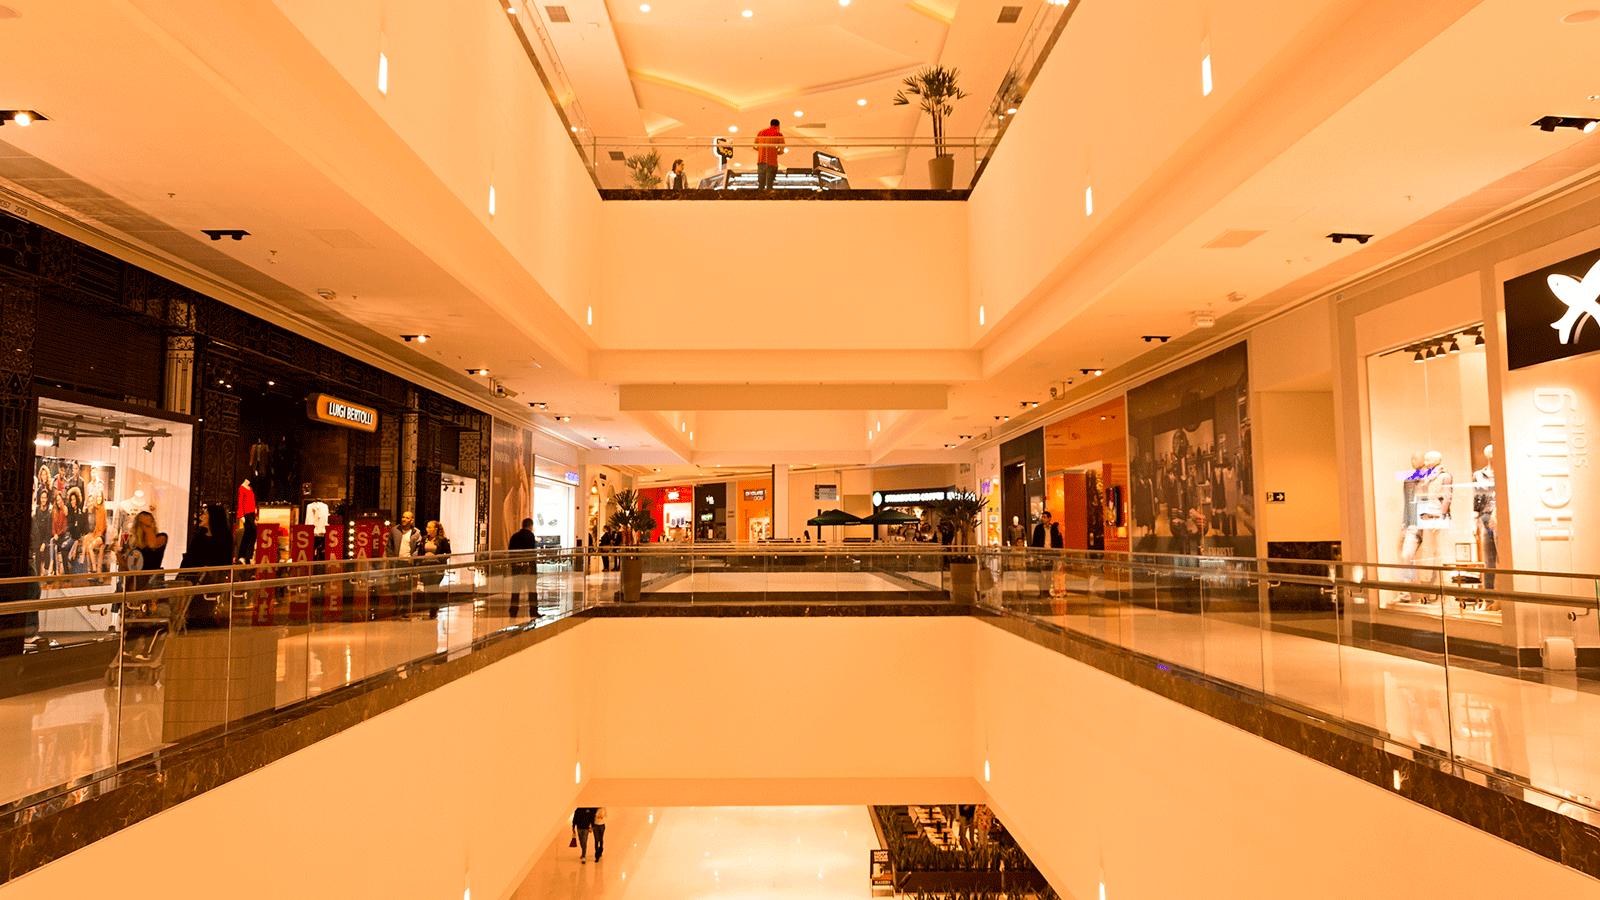 704bef93e8654 Parque Shopping Maia   Lopes Dias Arquitetura – Lopes Dias Arquitetura